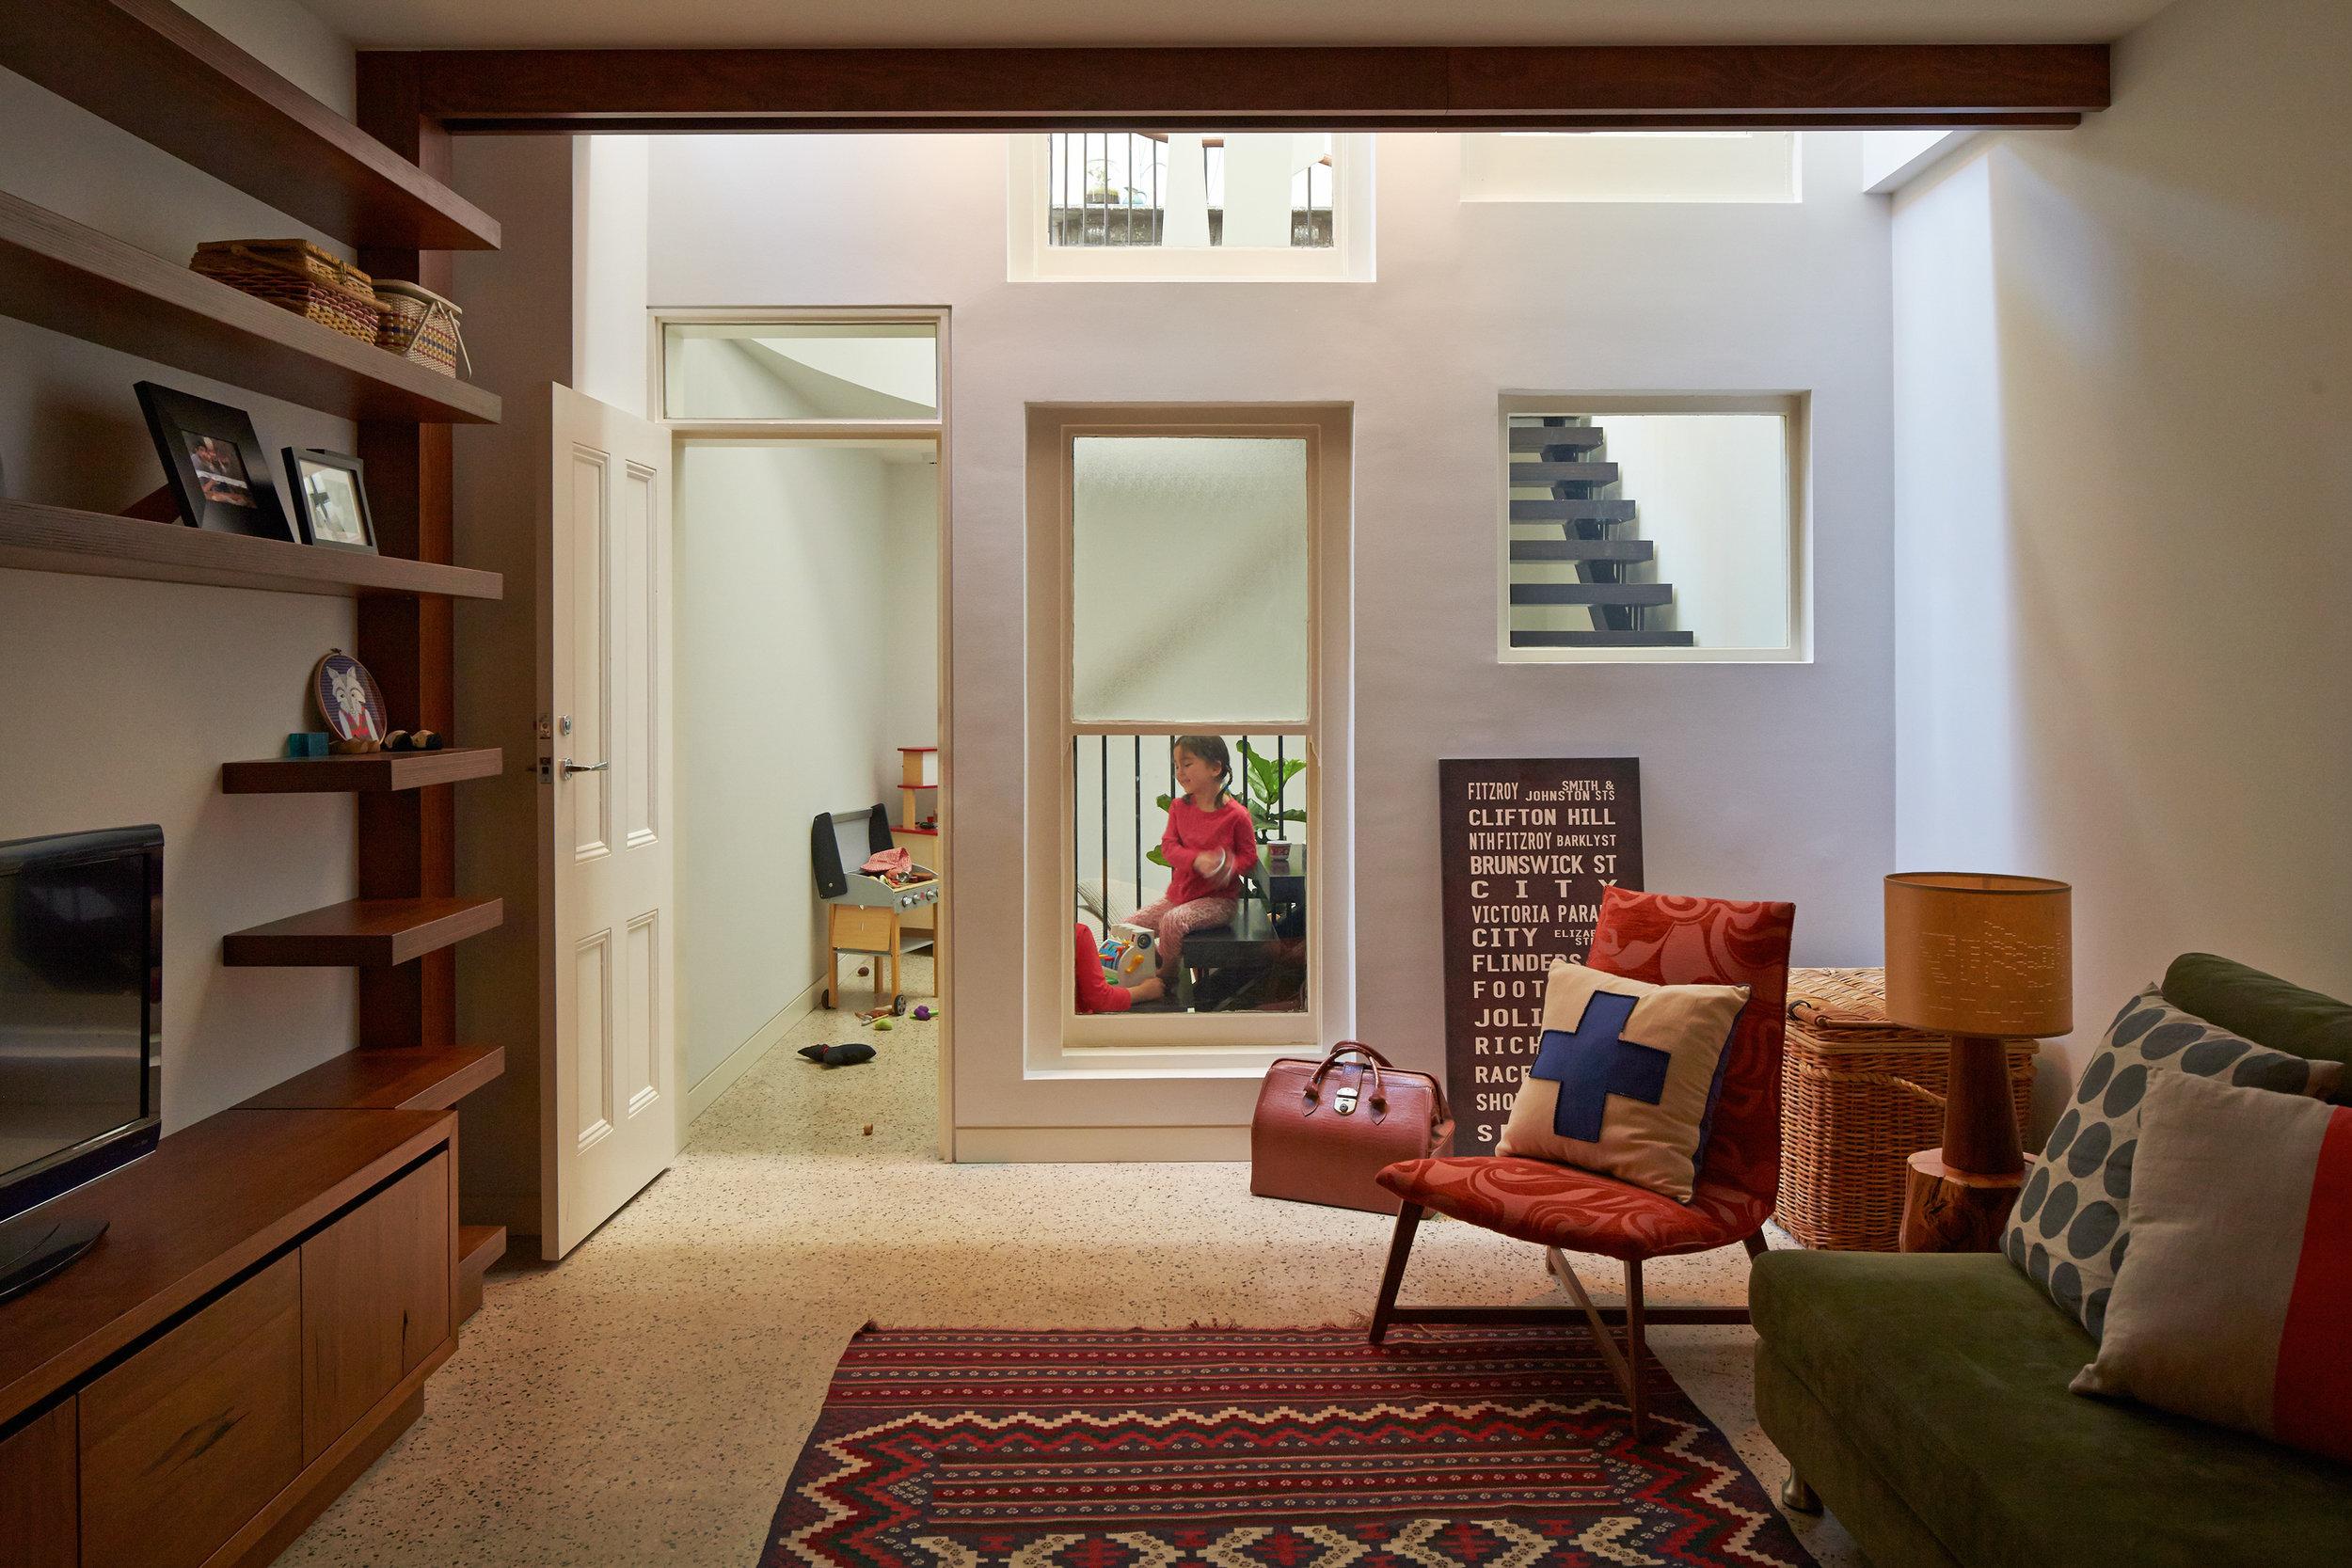 cubo-house-phooey-architects-the-design-emotive-28.jpg